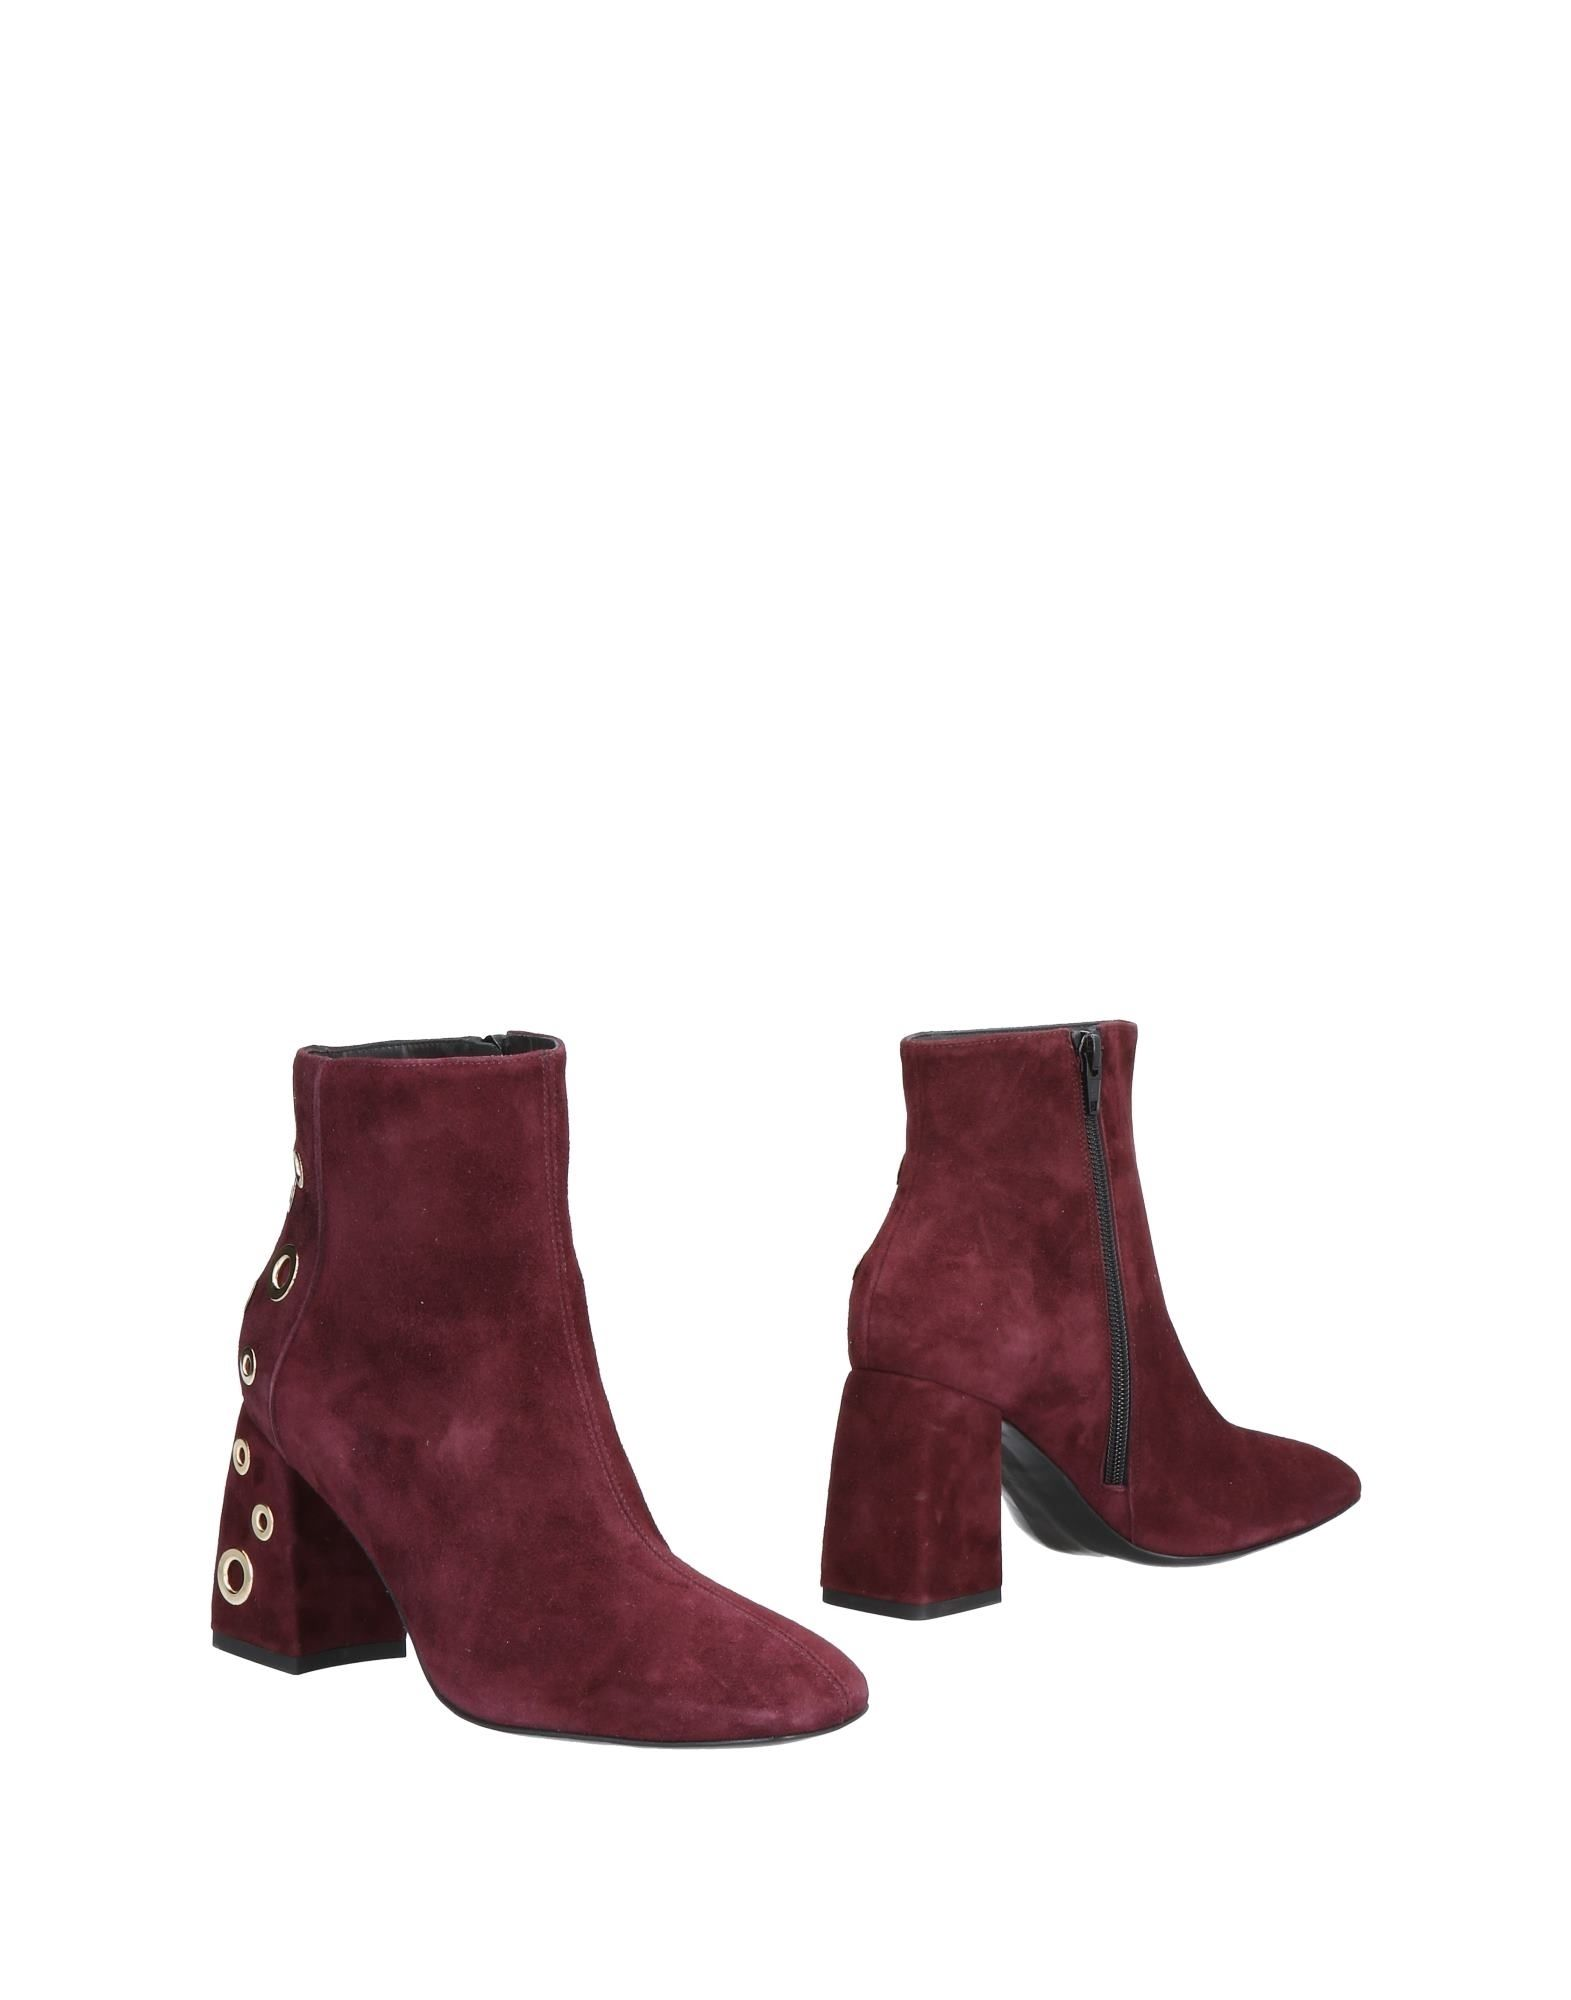 Gut tragenJeannot um billige Schuhe zu tragenJeannot Gut Stiefelette Damen 11491404WK a10354